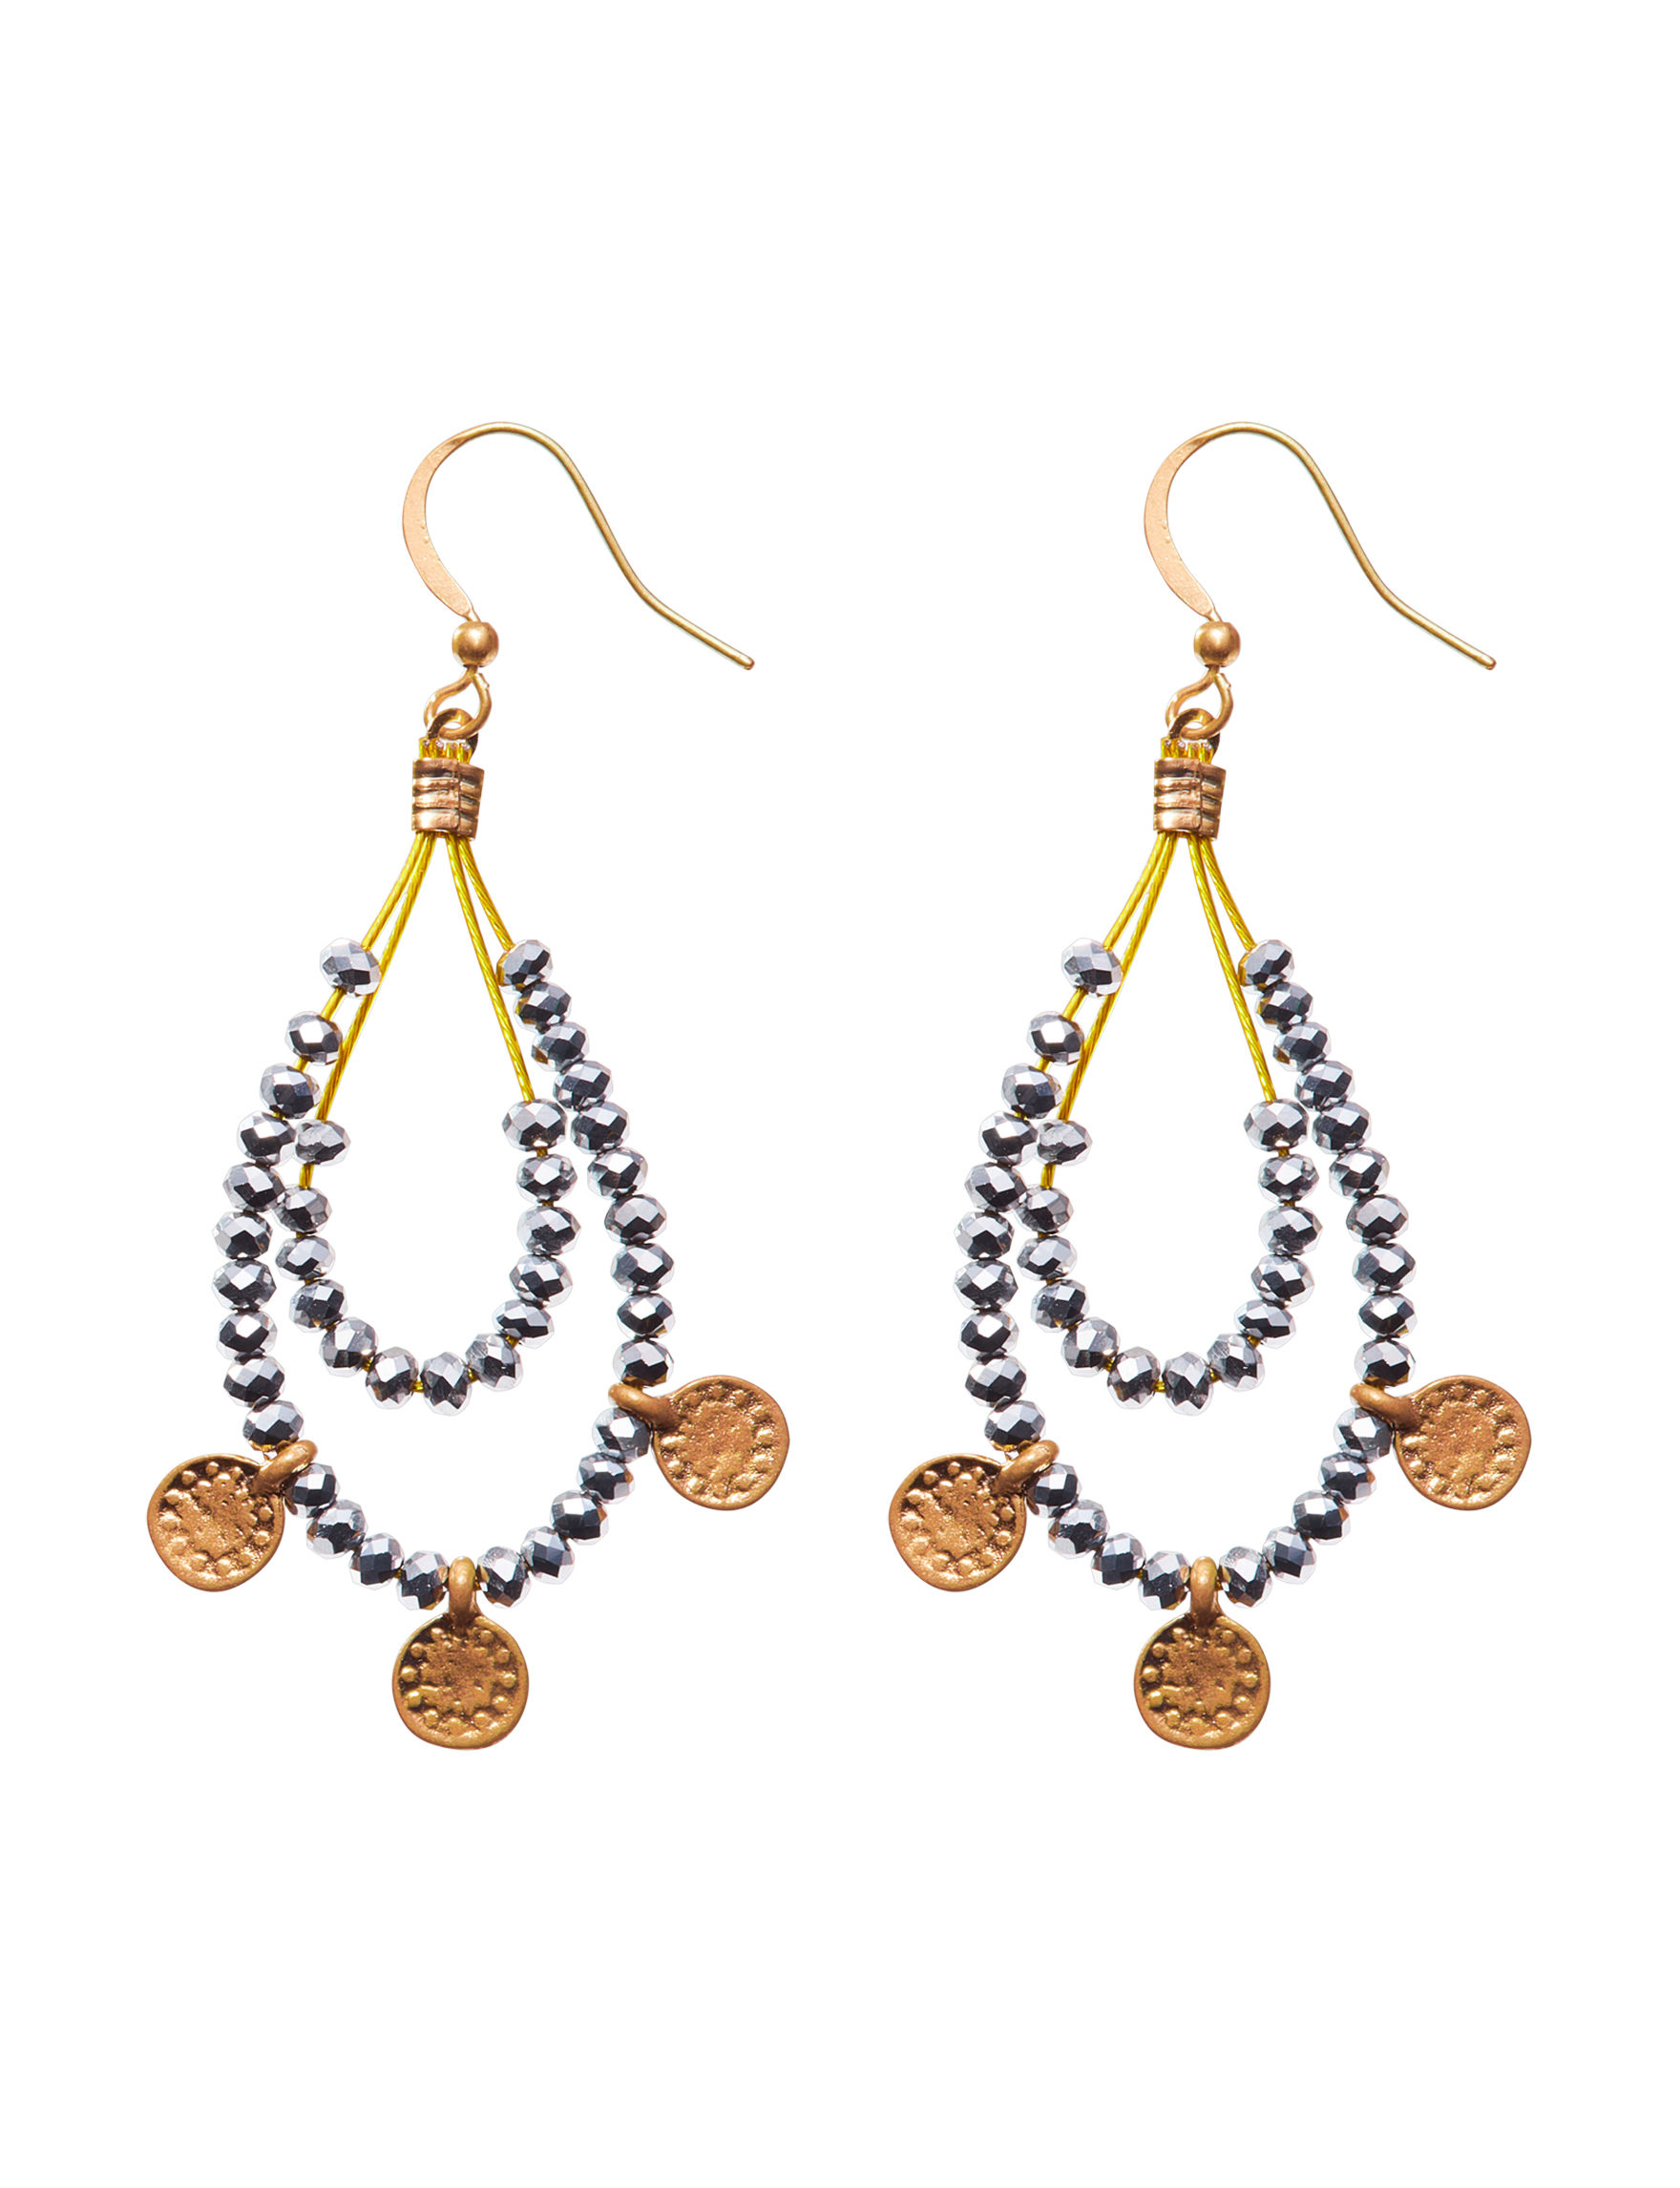 Hannah Hematite Drops Earrings Fashion Jewelry